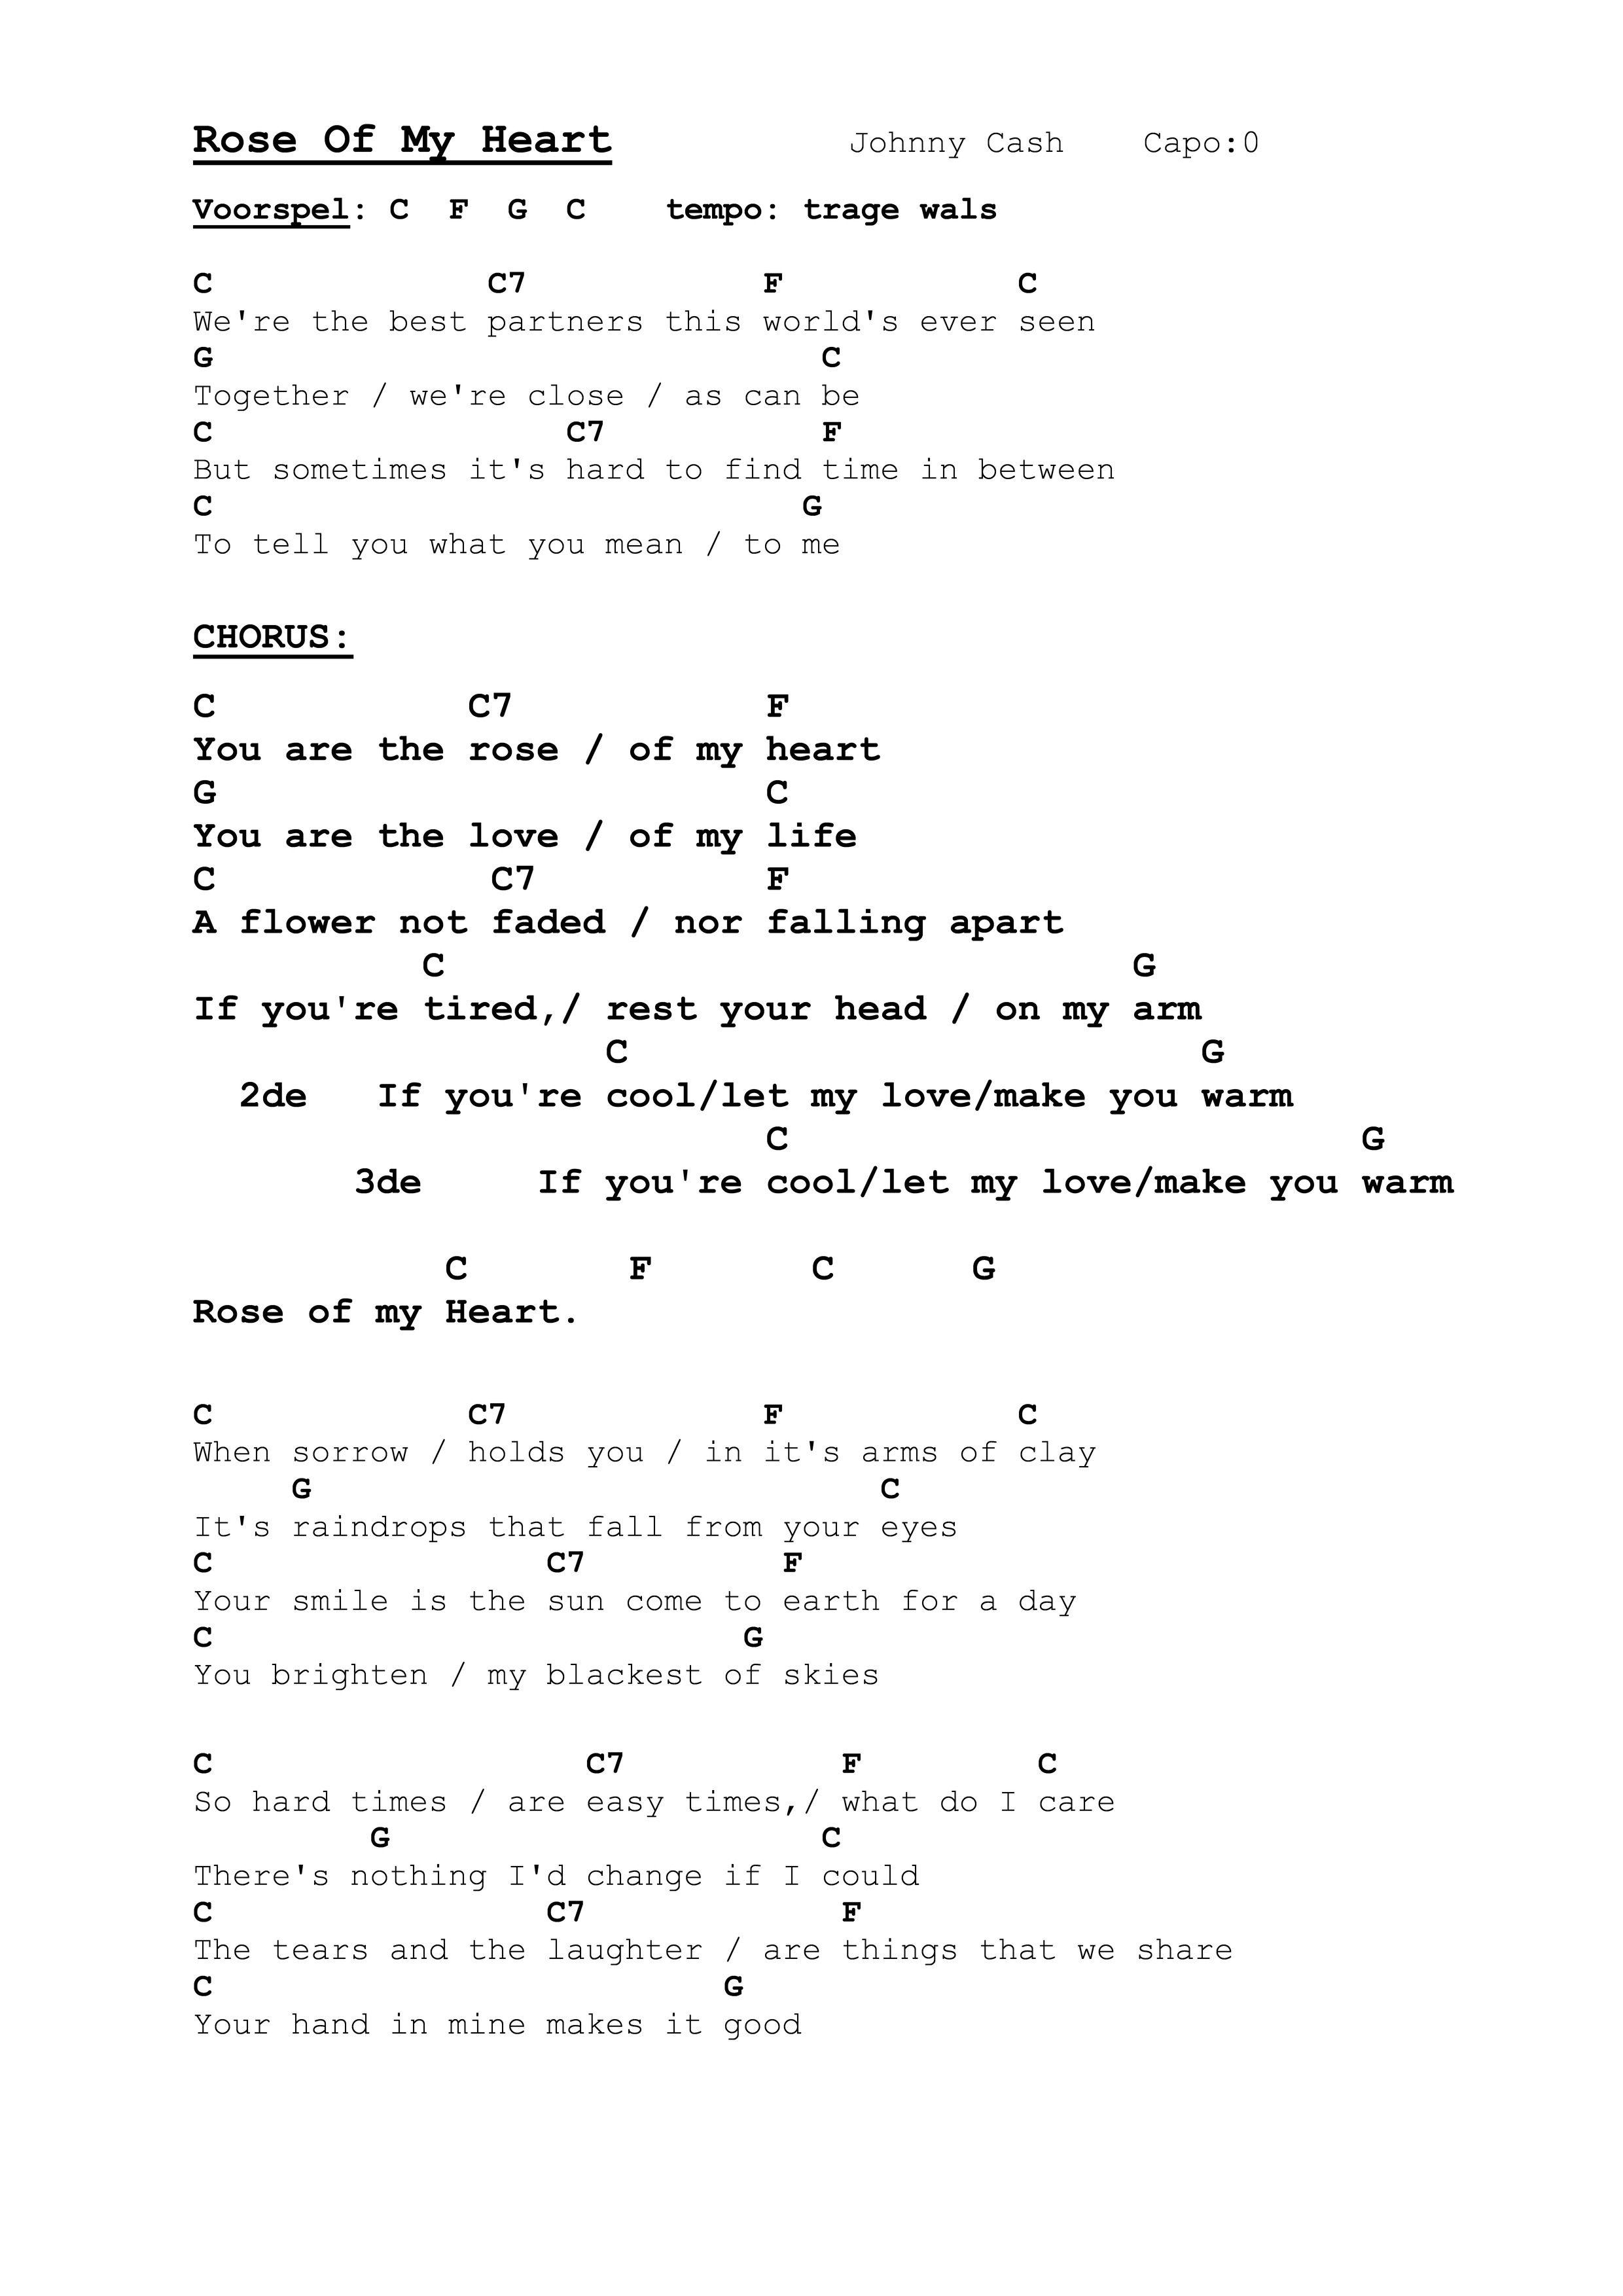 Pin by szllsi erika on gitr pinterest ukulele chords hexwebz Image collections